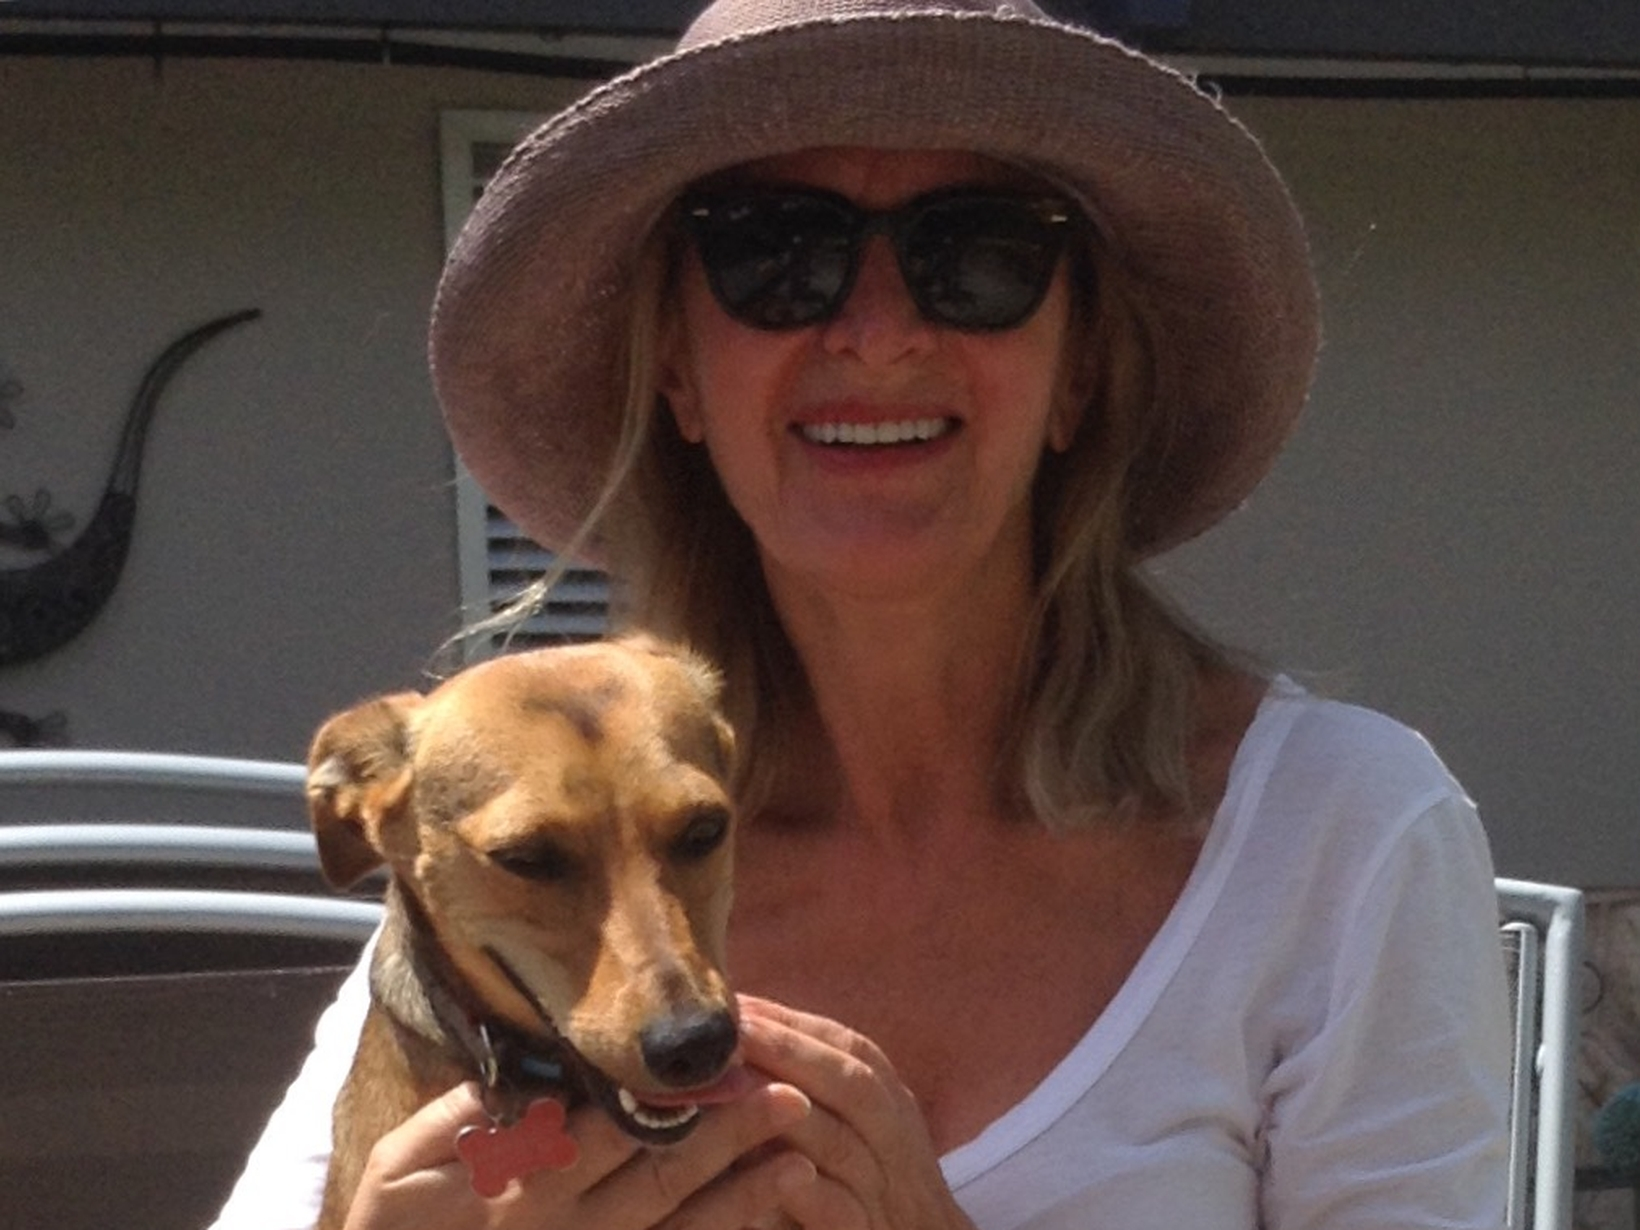 Barbara from Sydney, New South Wales, Australia